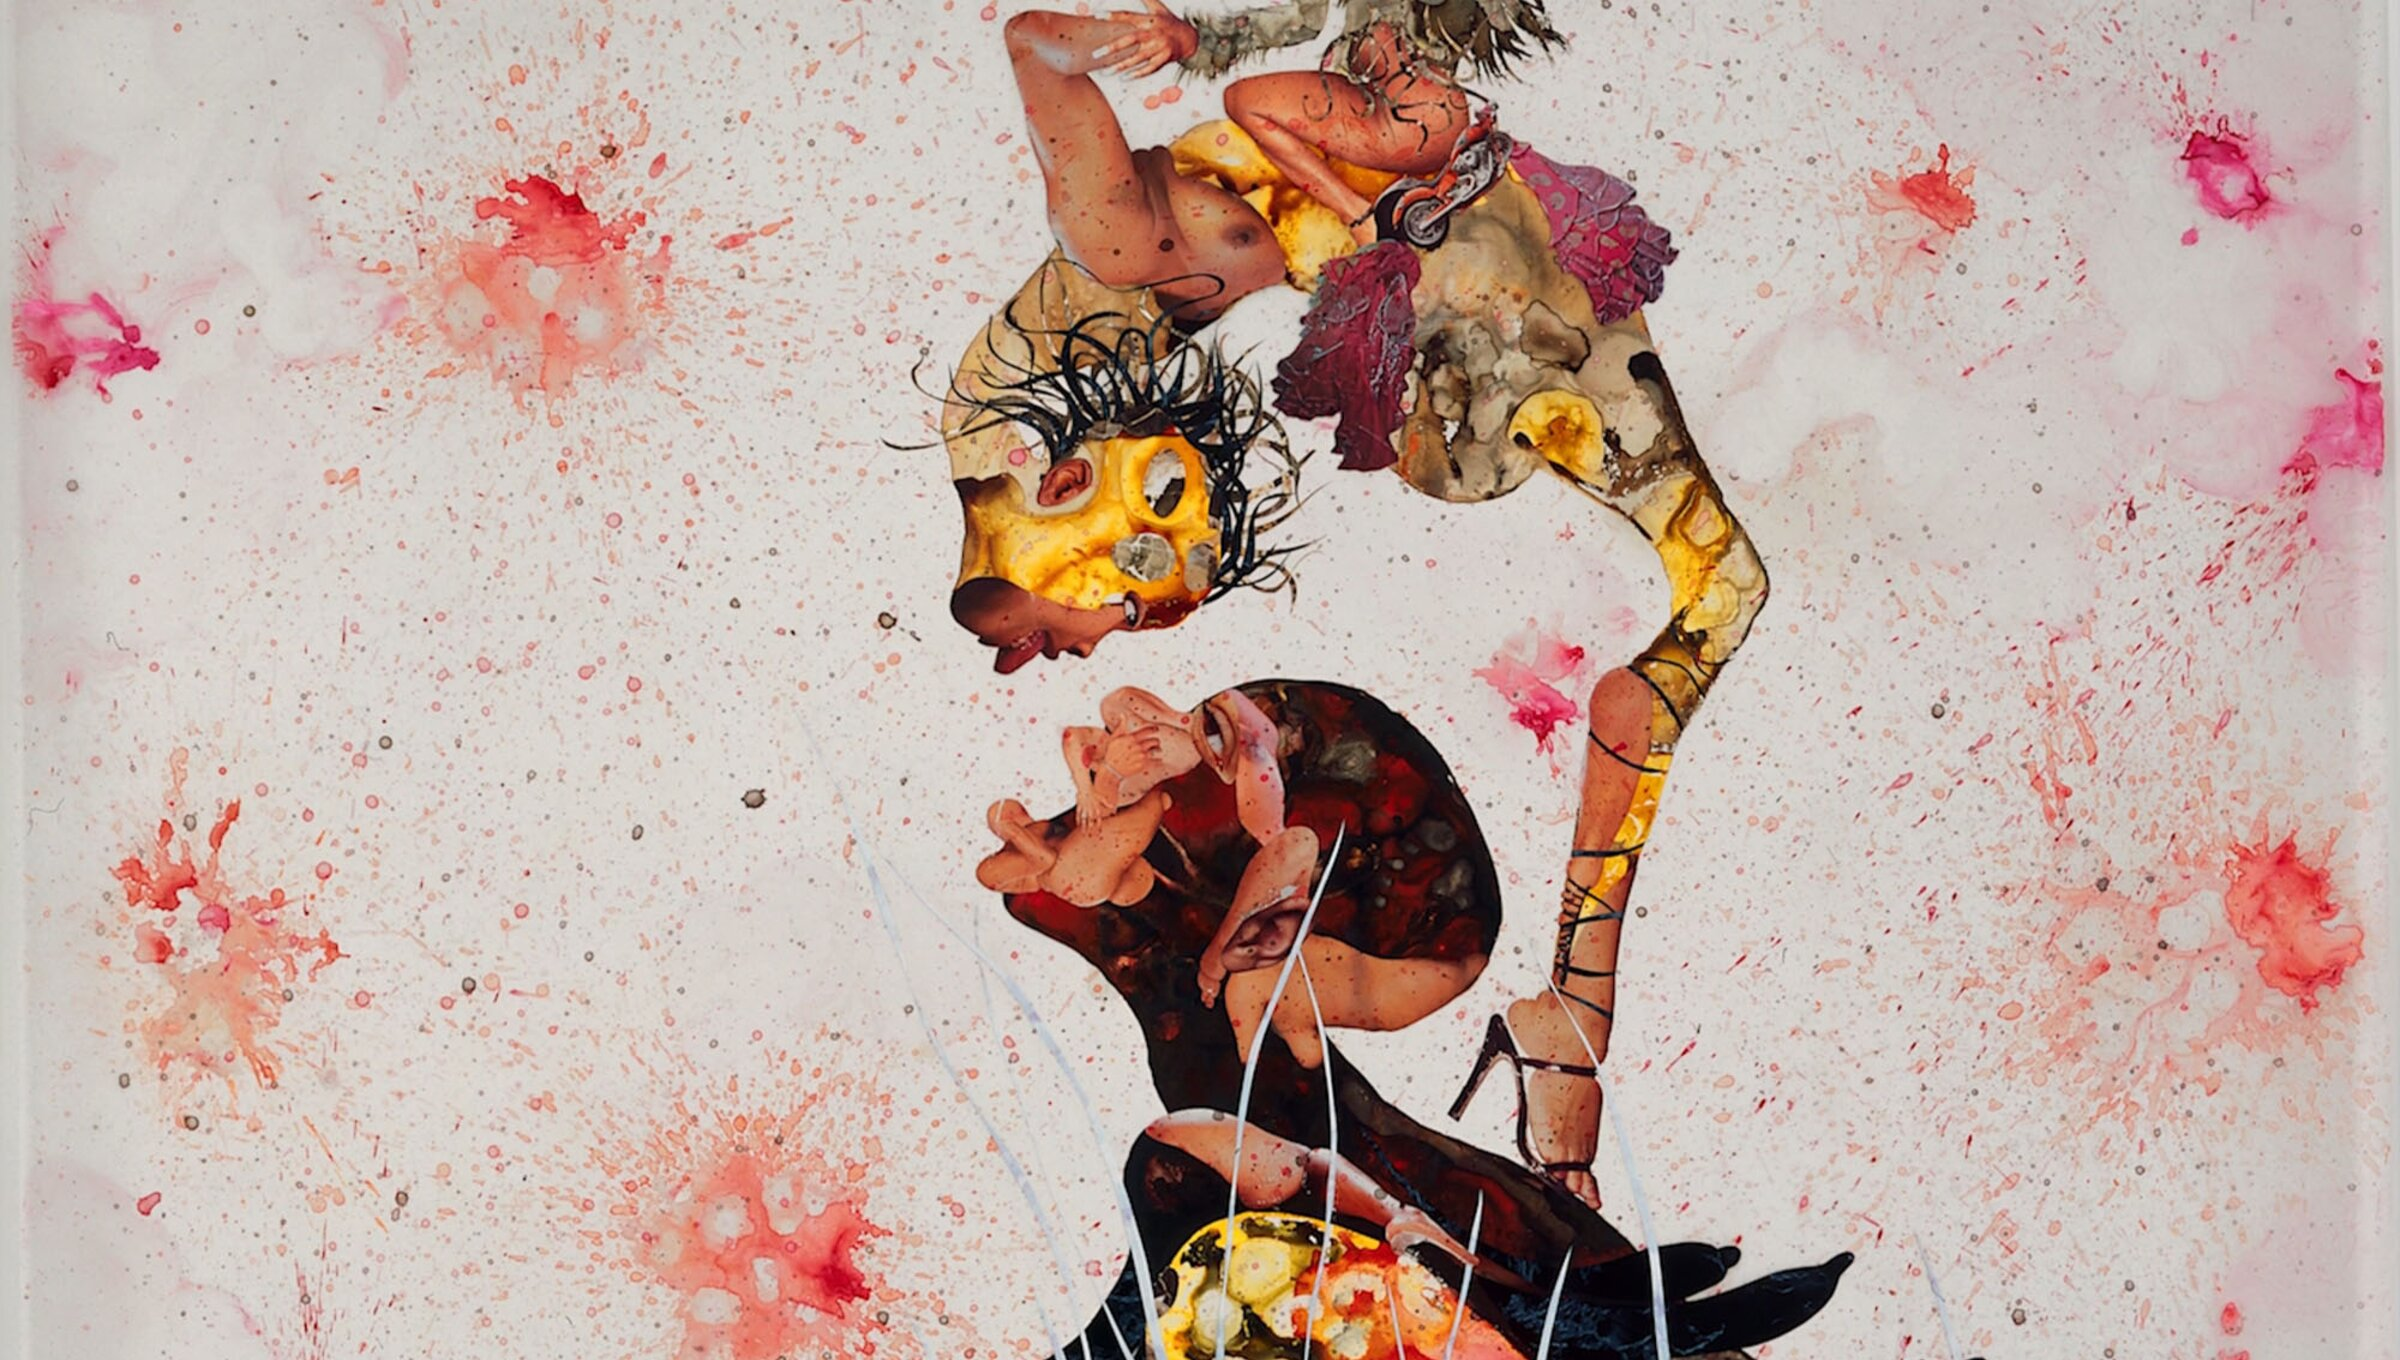 Wangechi Mutu's otherworldly artworks grow from the ground up | Psyche